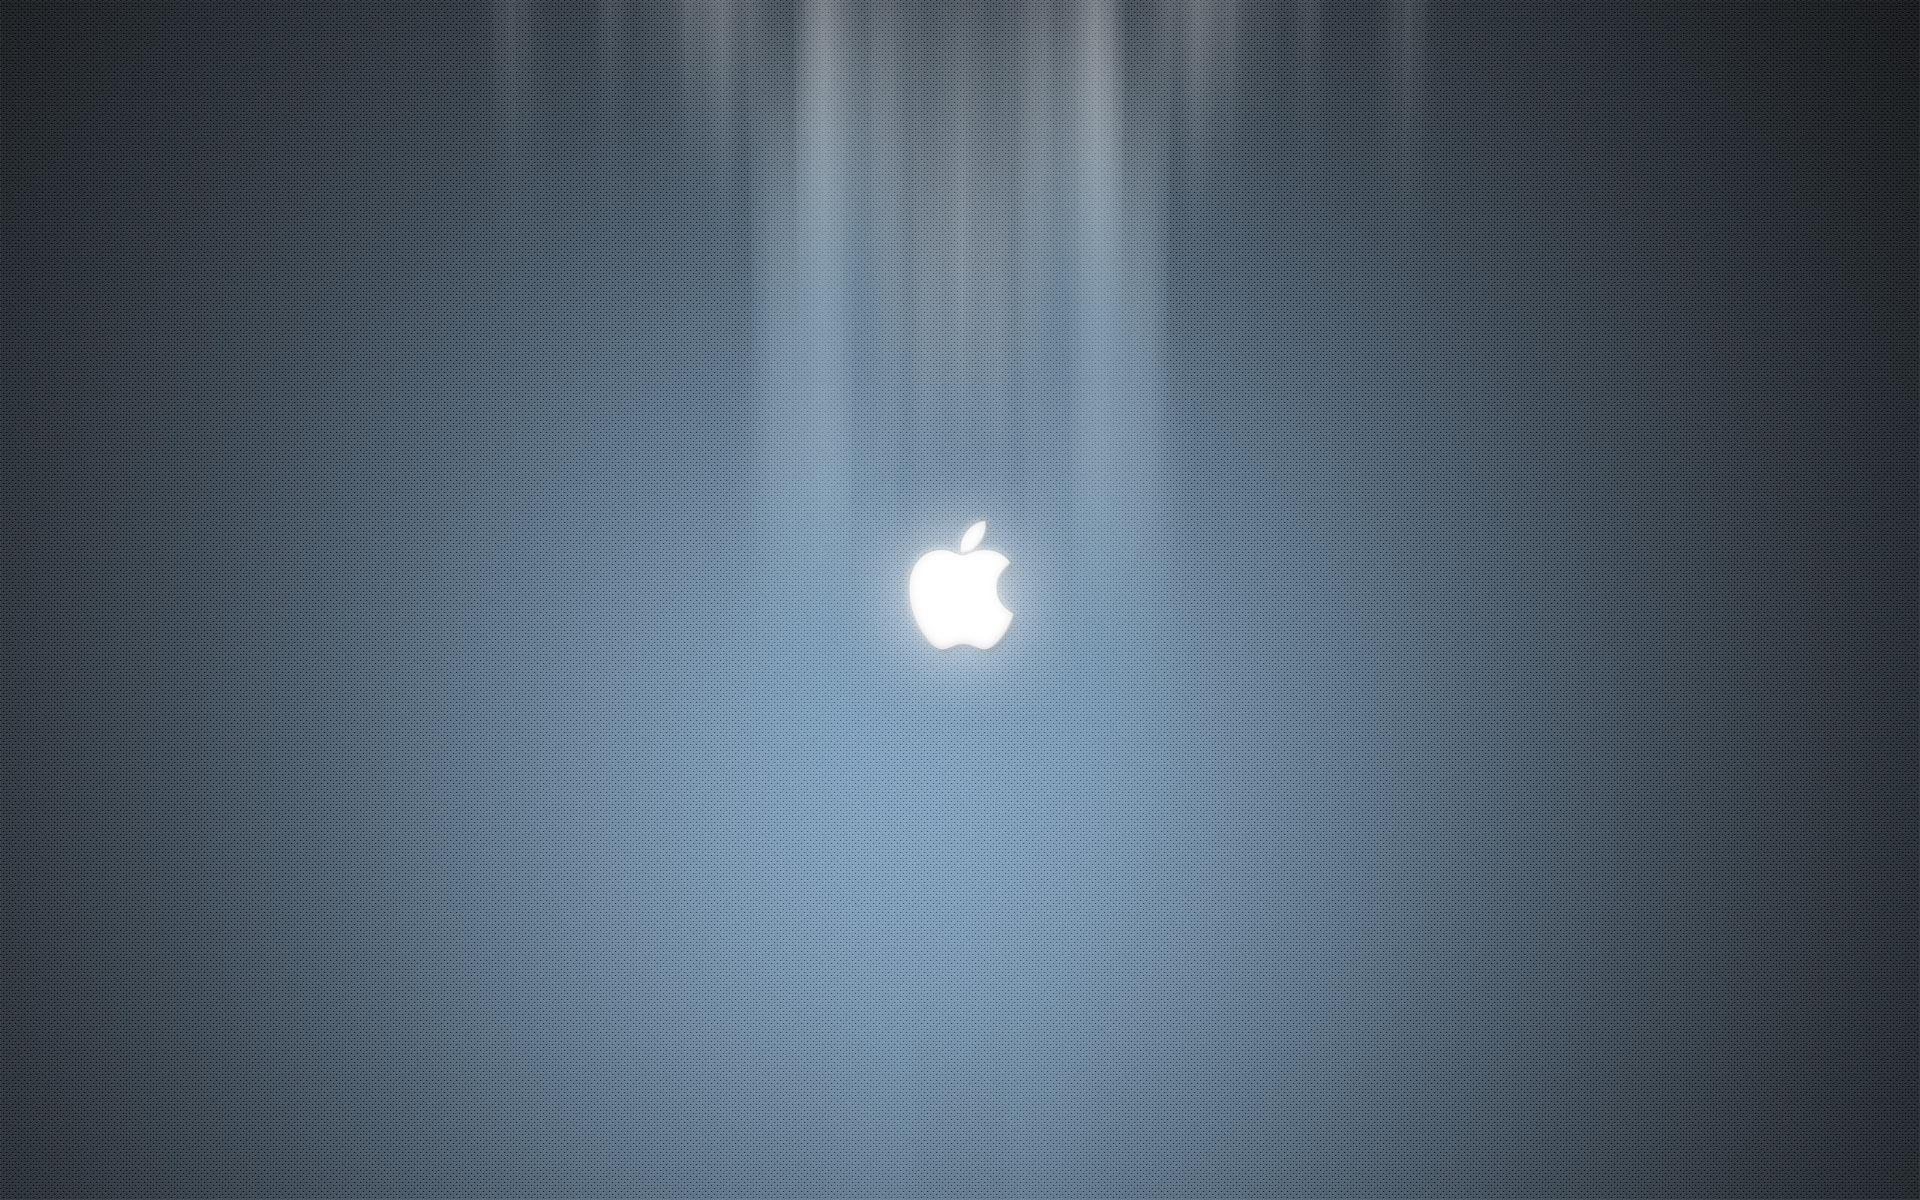 картинки эппл на рабочий стол